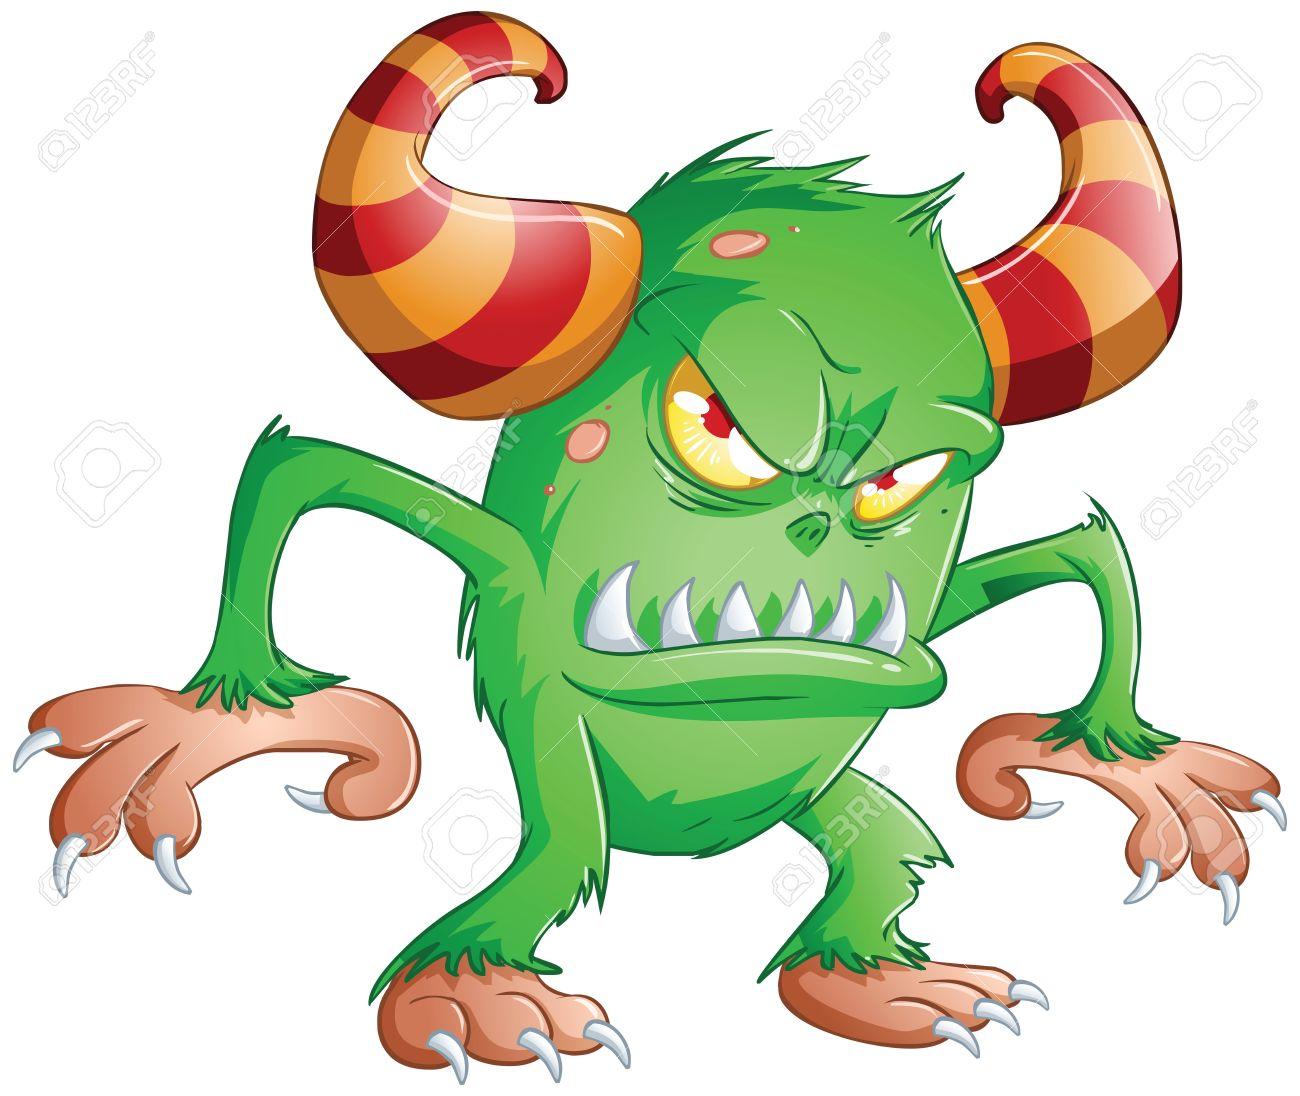 Alien clipart spooky. Scary monster cartoon free